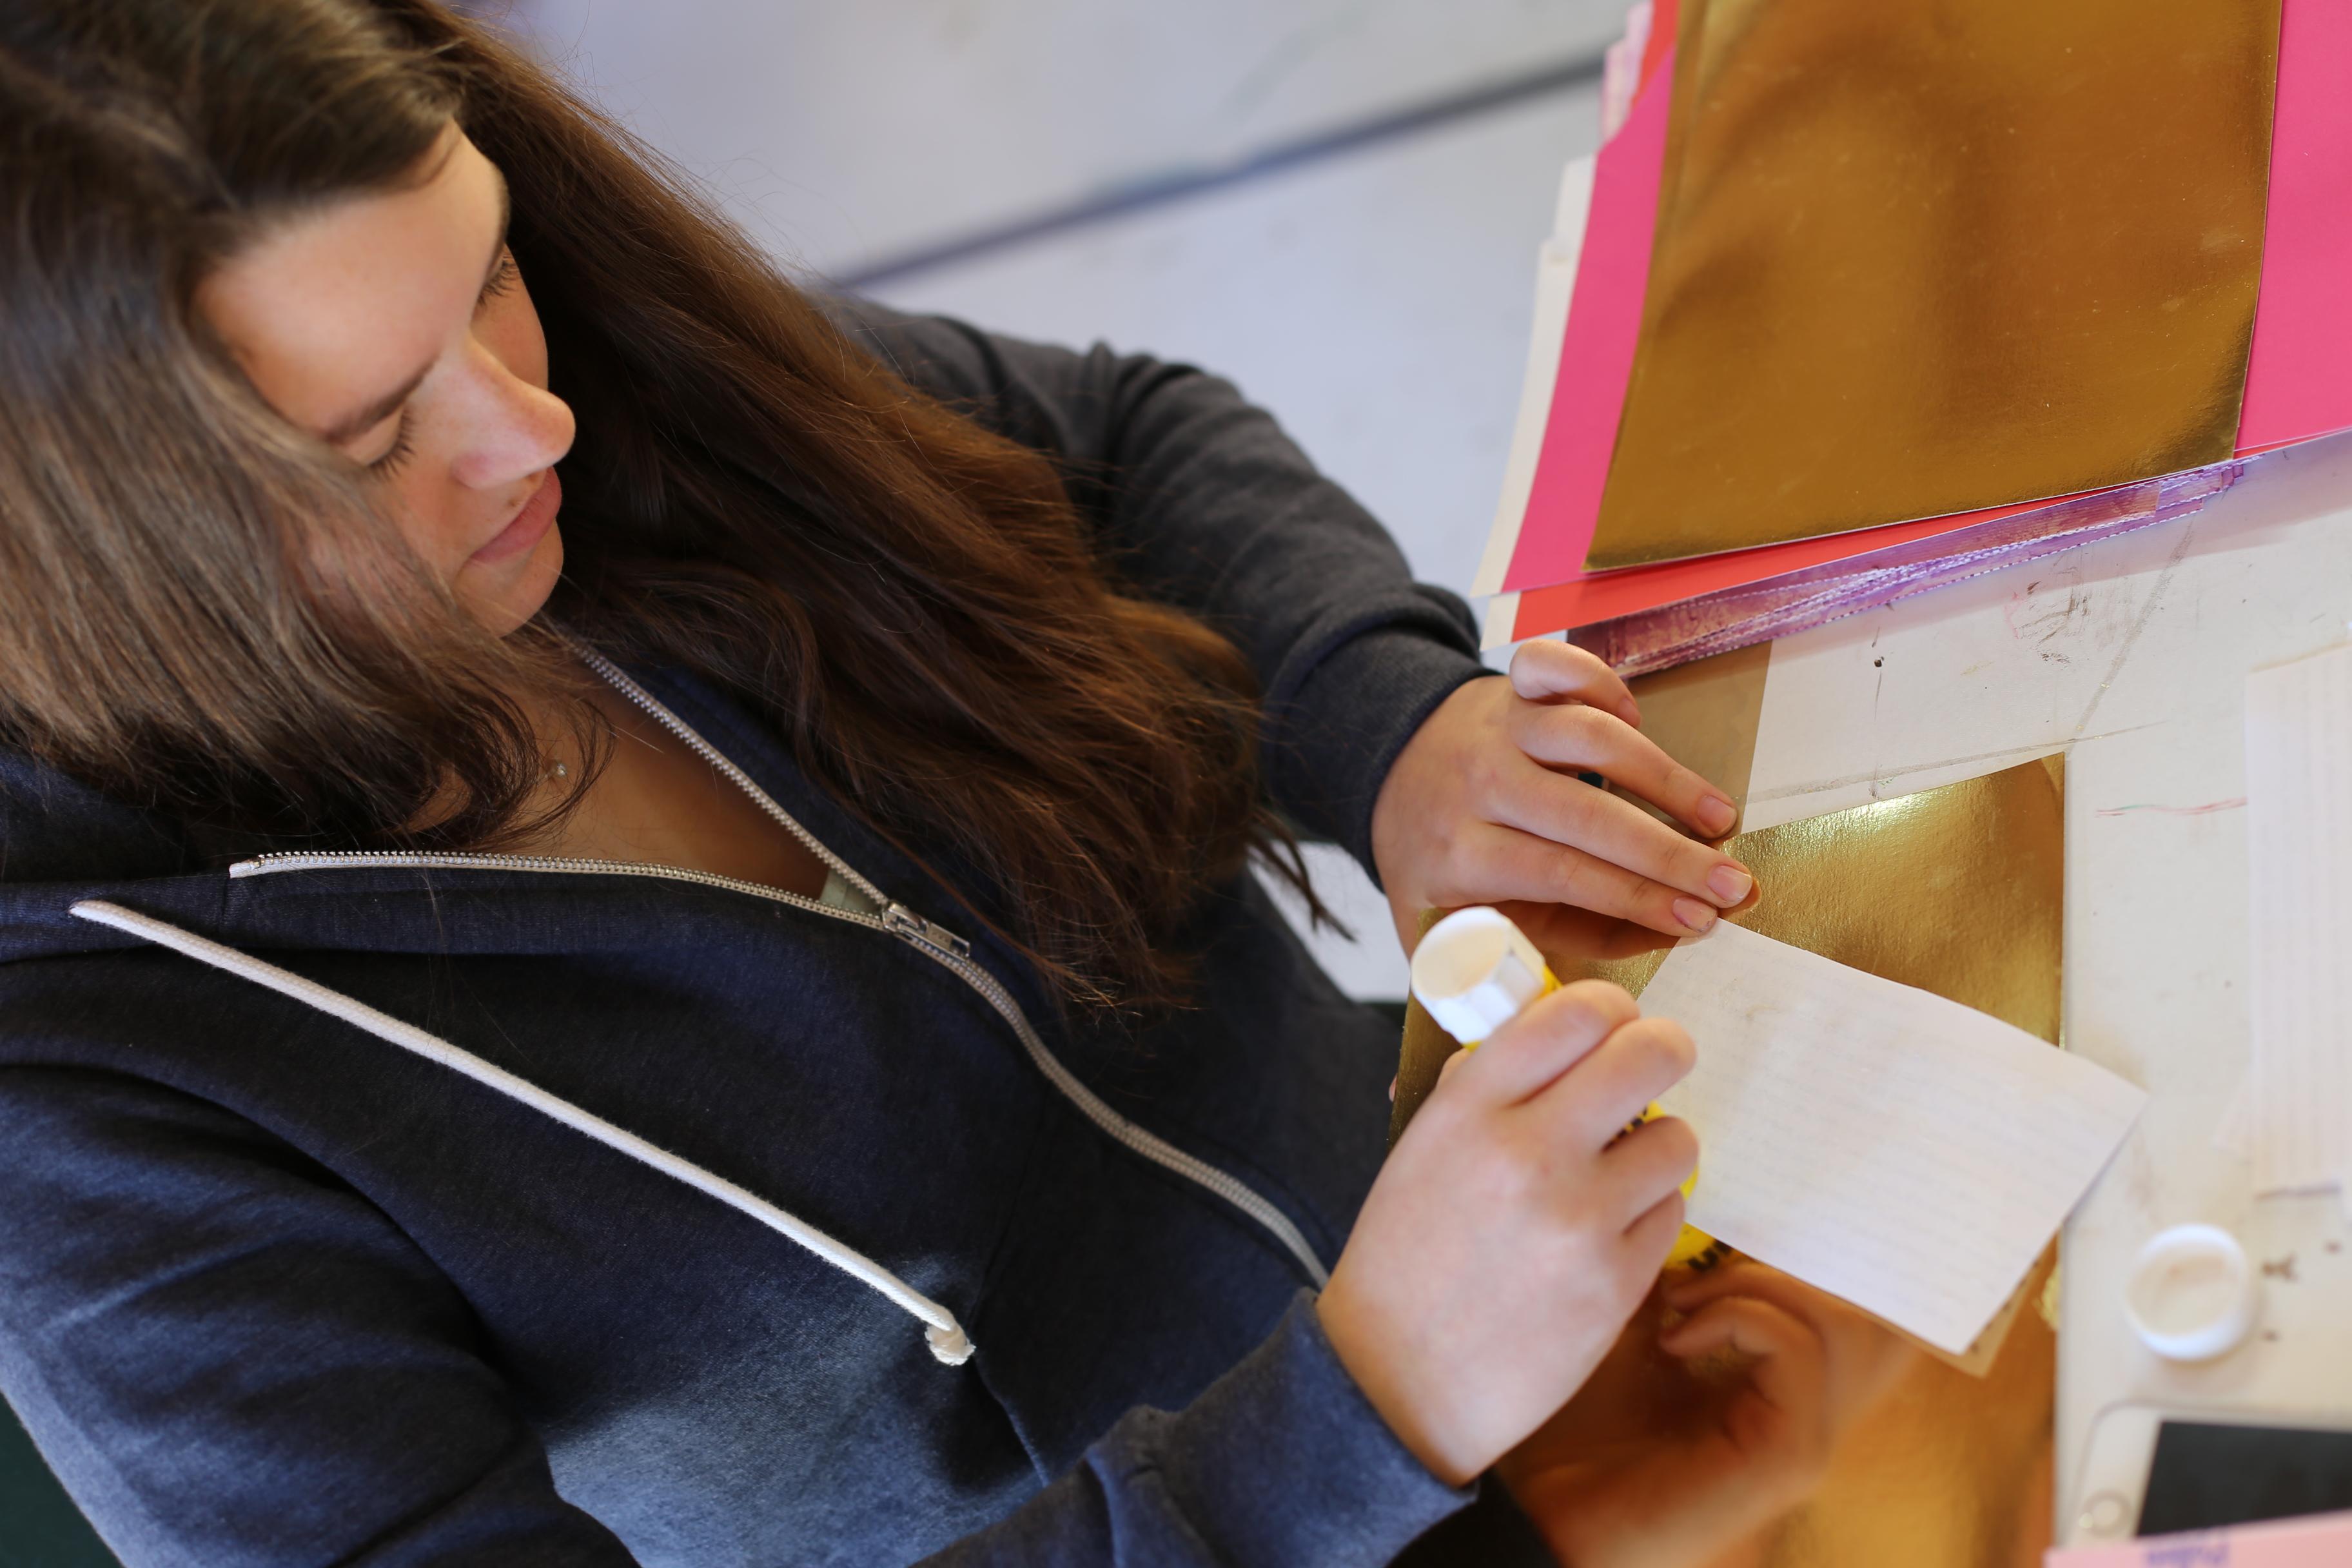 european art classroom proctor academy aix en provence france